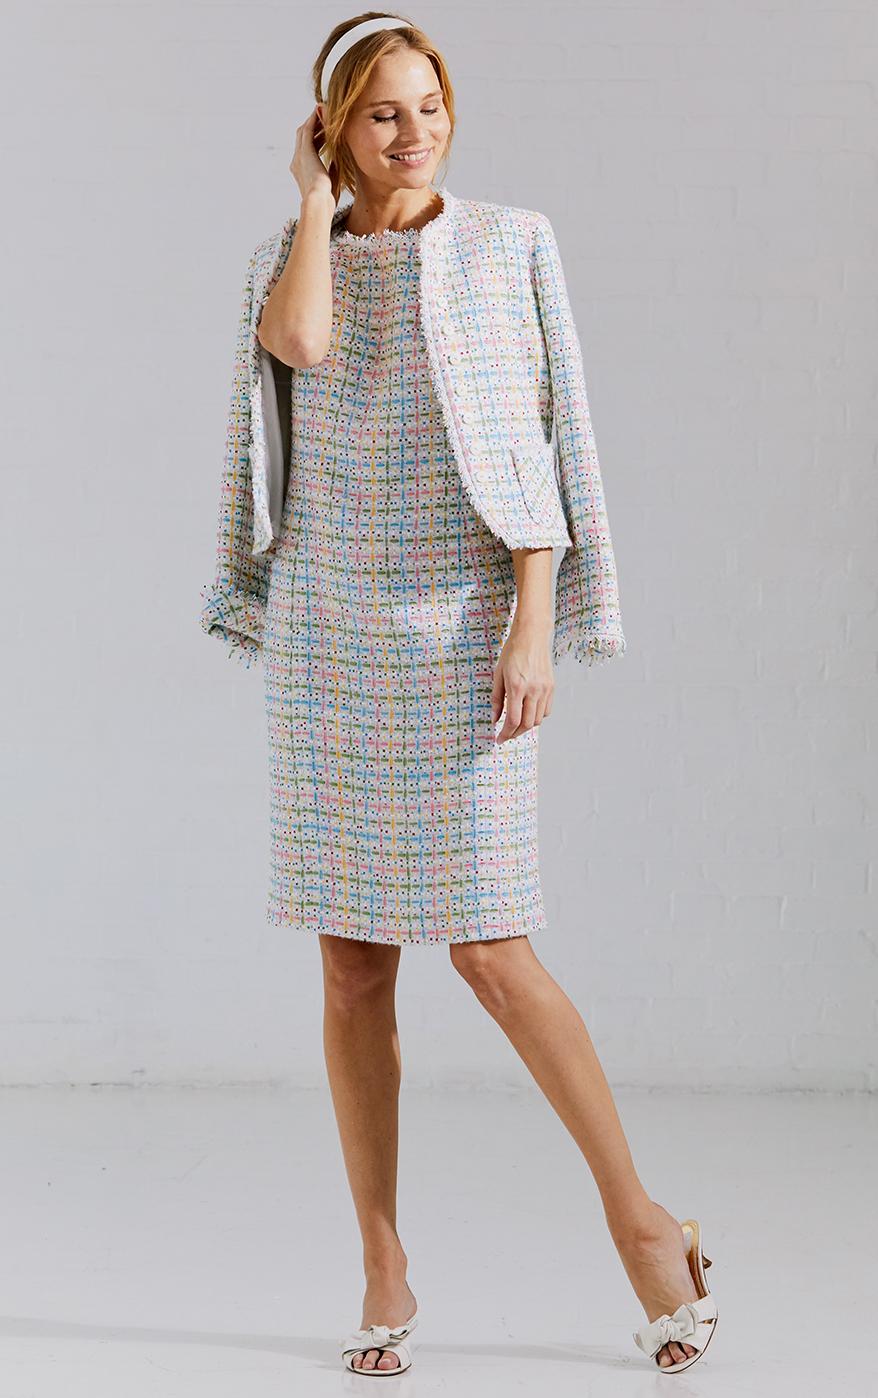 Caprice Dress & Jacket